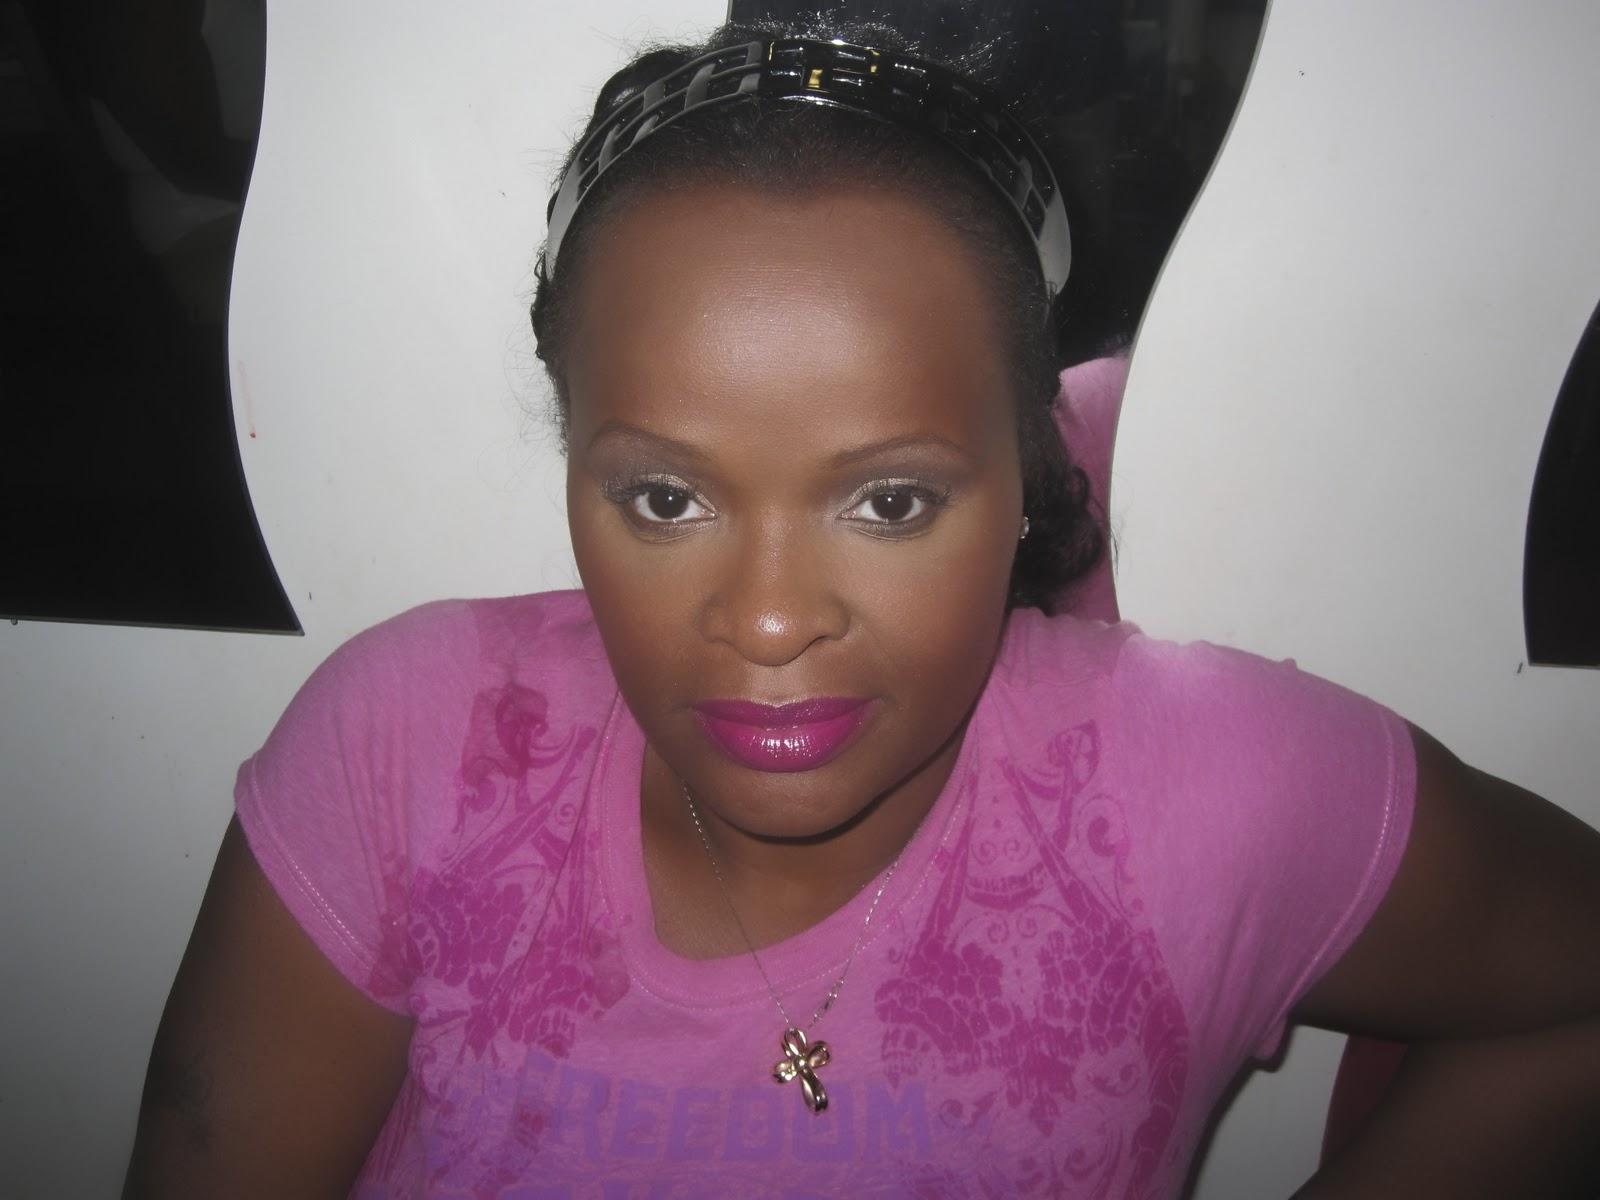 ... Face Makeup...Makeup Whores, Lend Me Your Ear!!!: Makeup Consultation